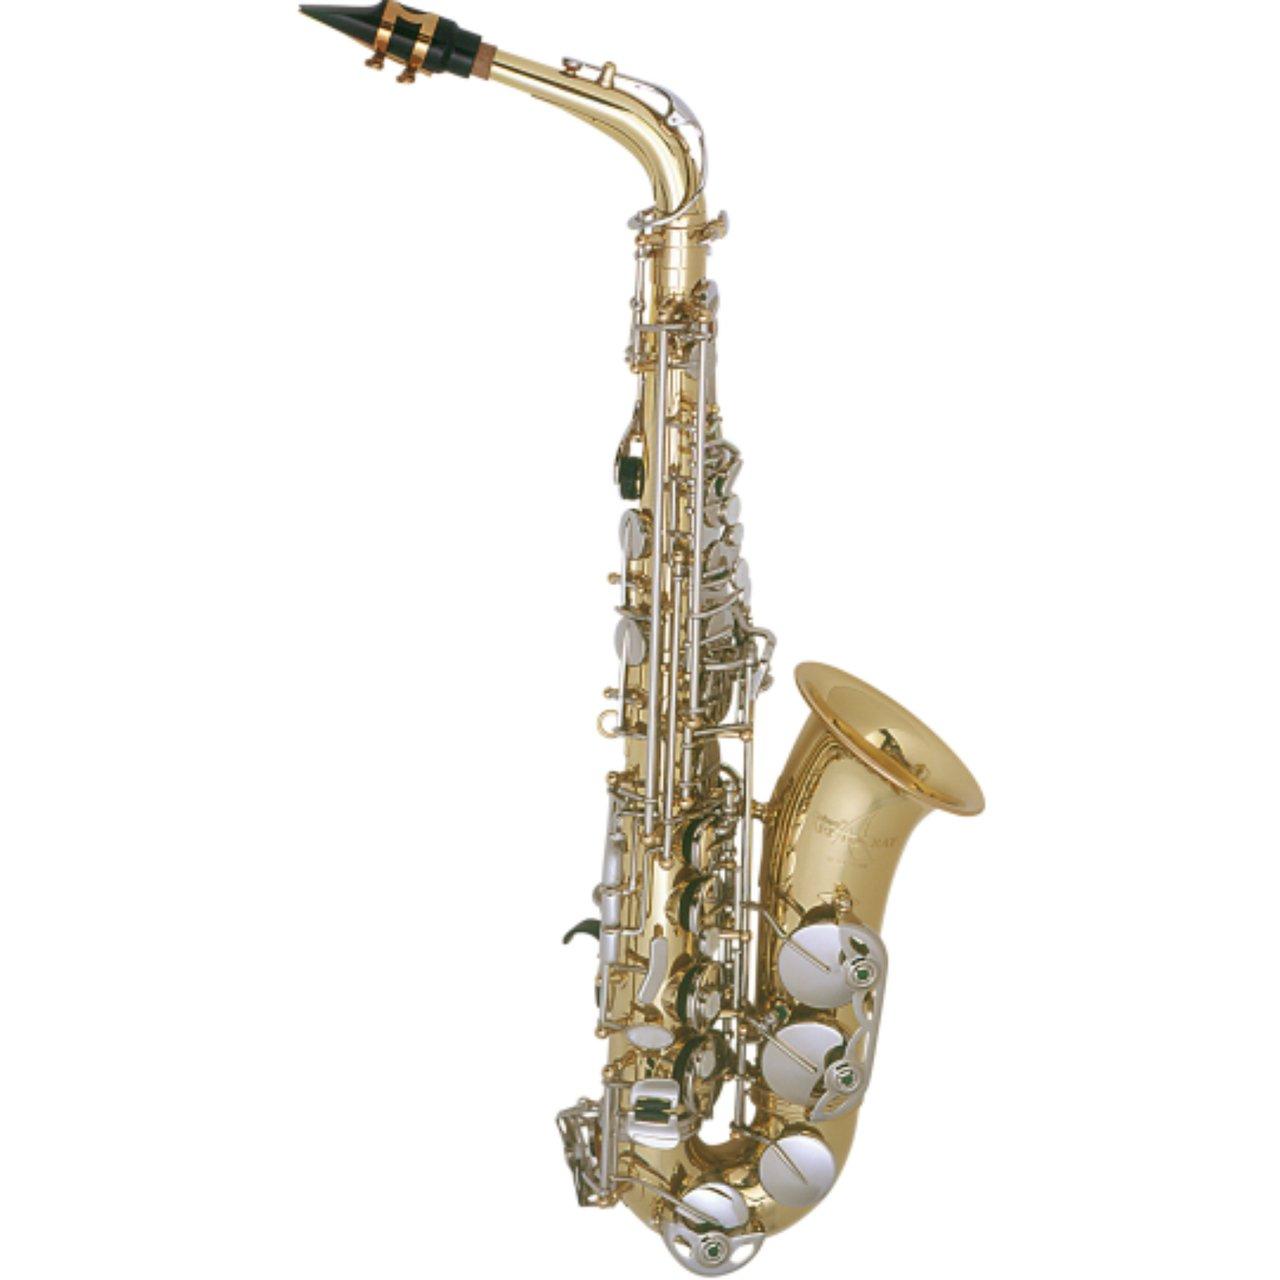 Selmer Student Model AS600 Alto Saxophone